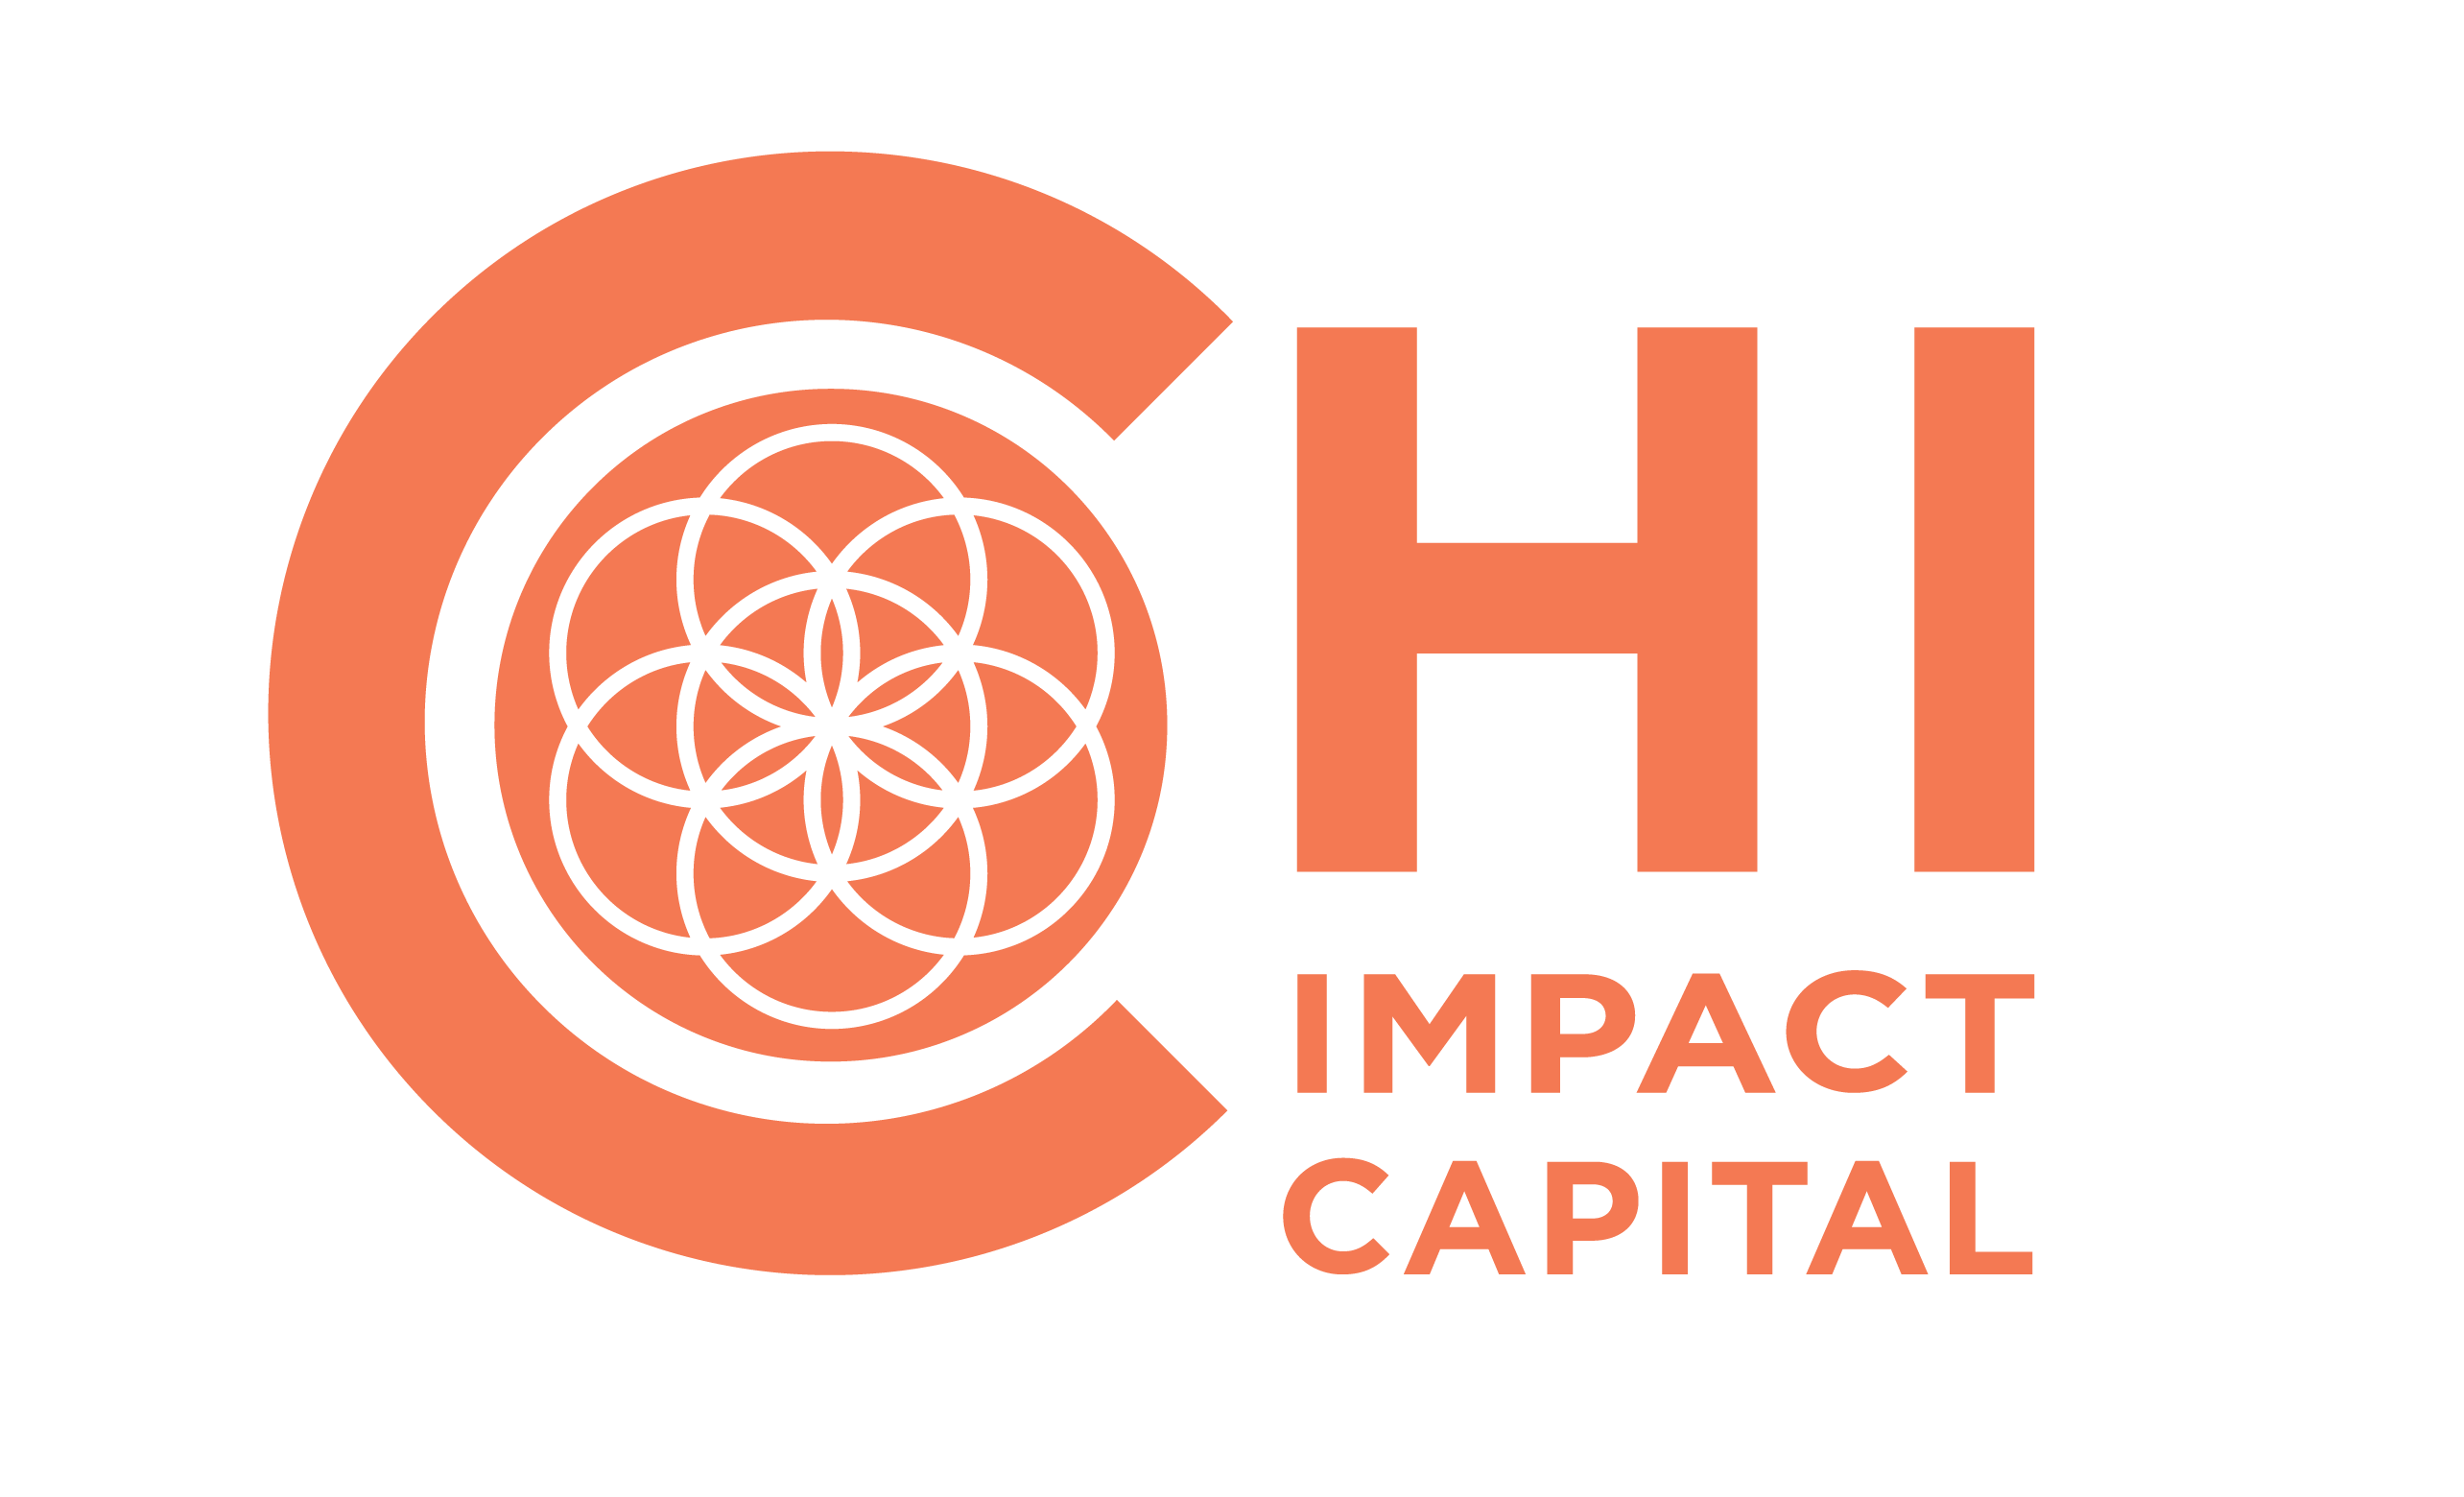 chi impact